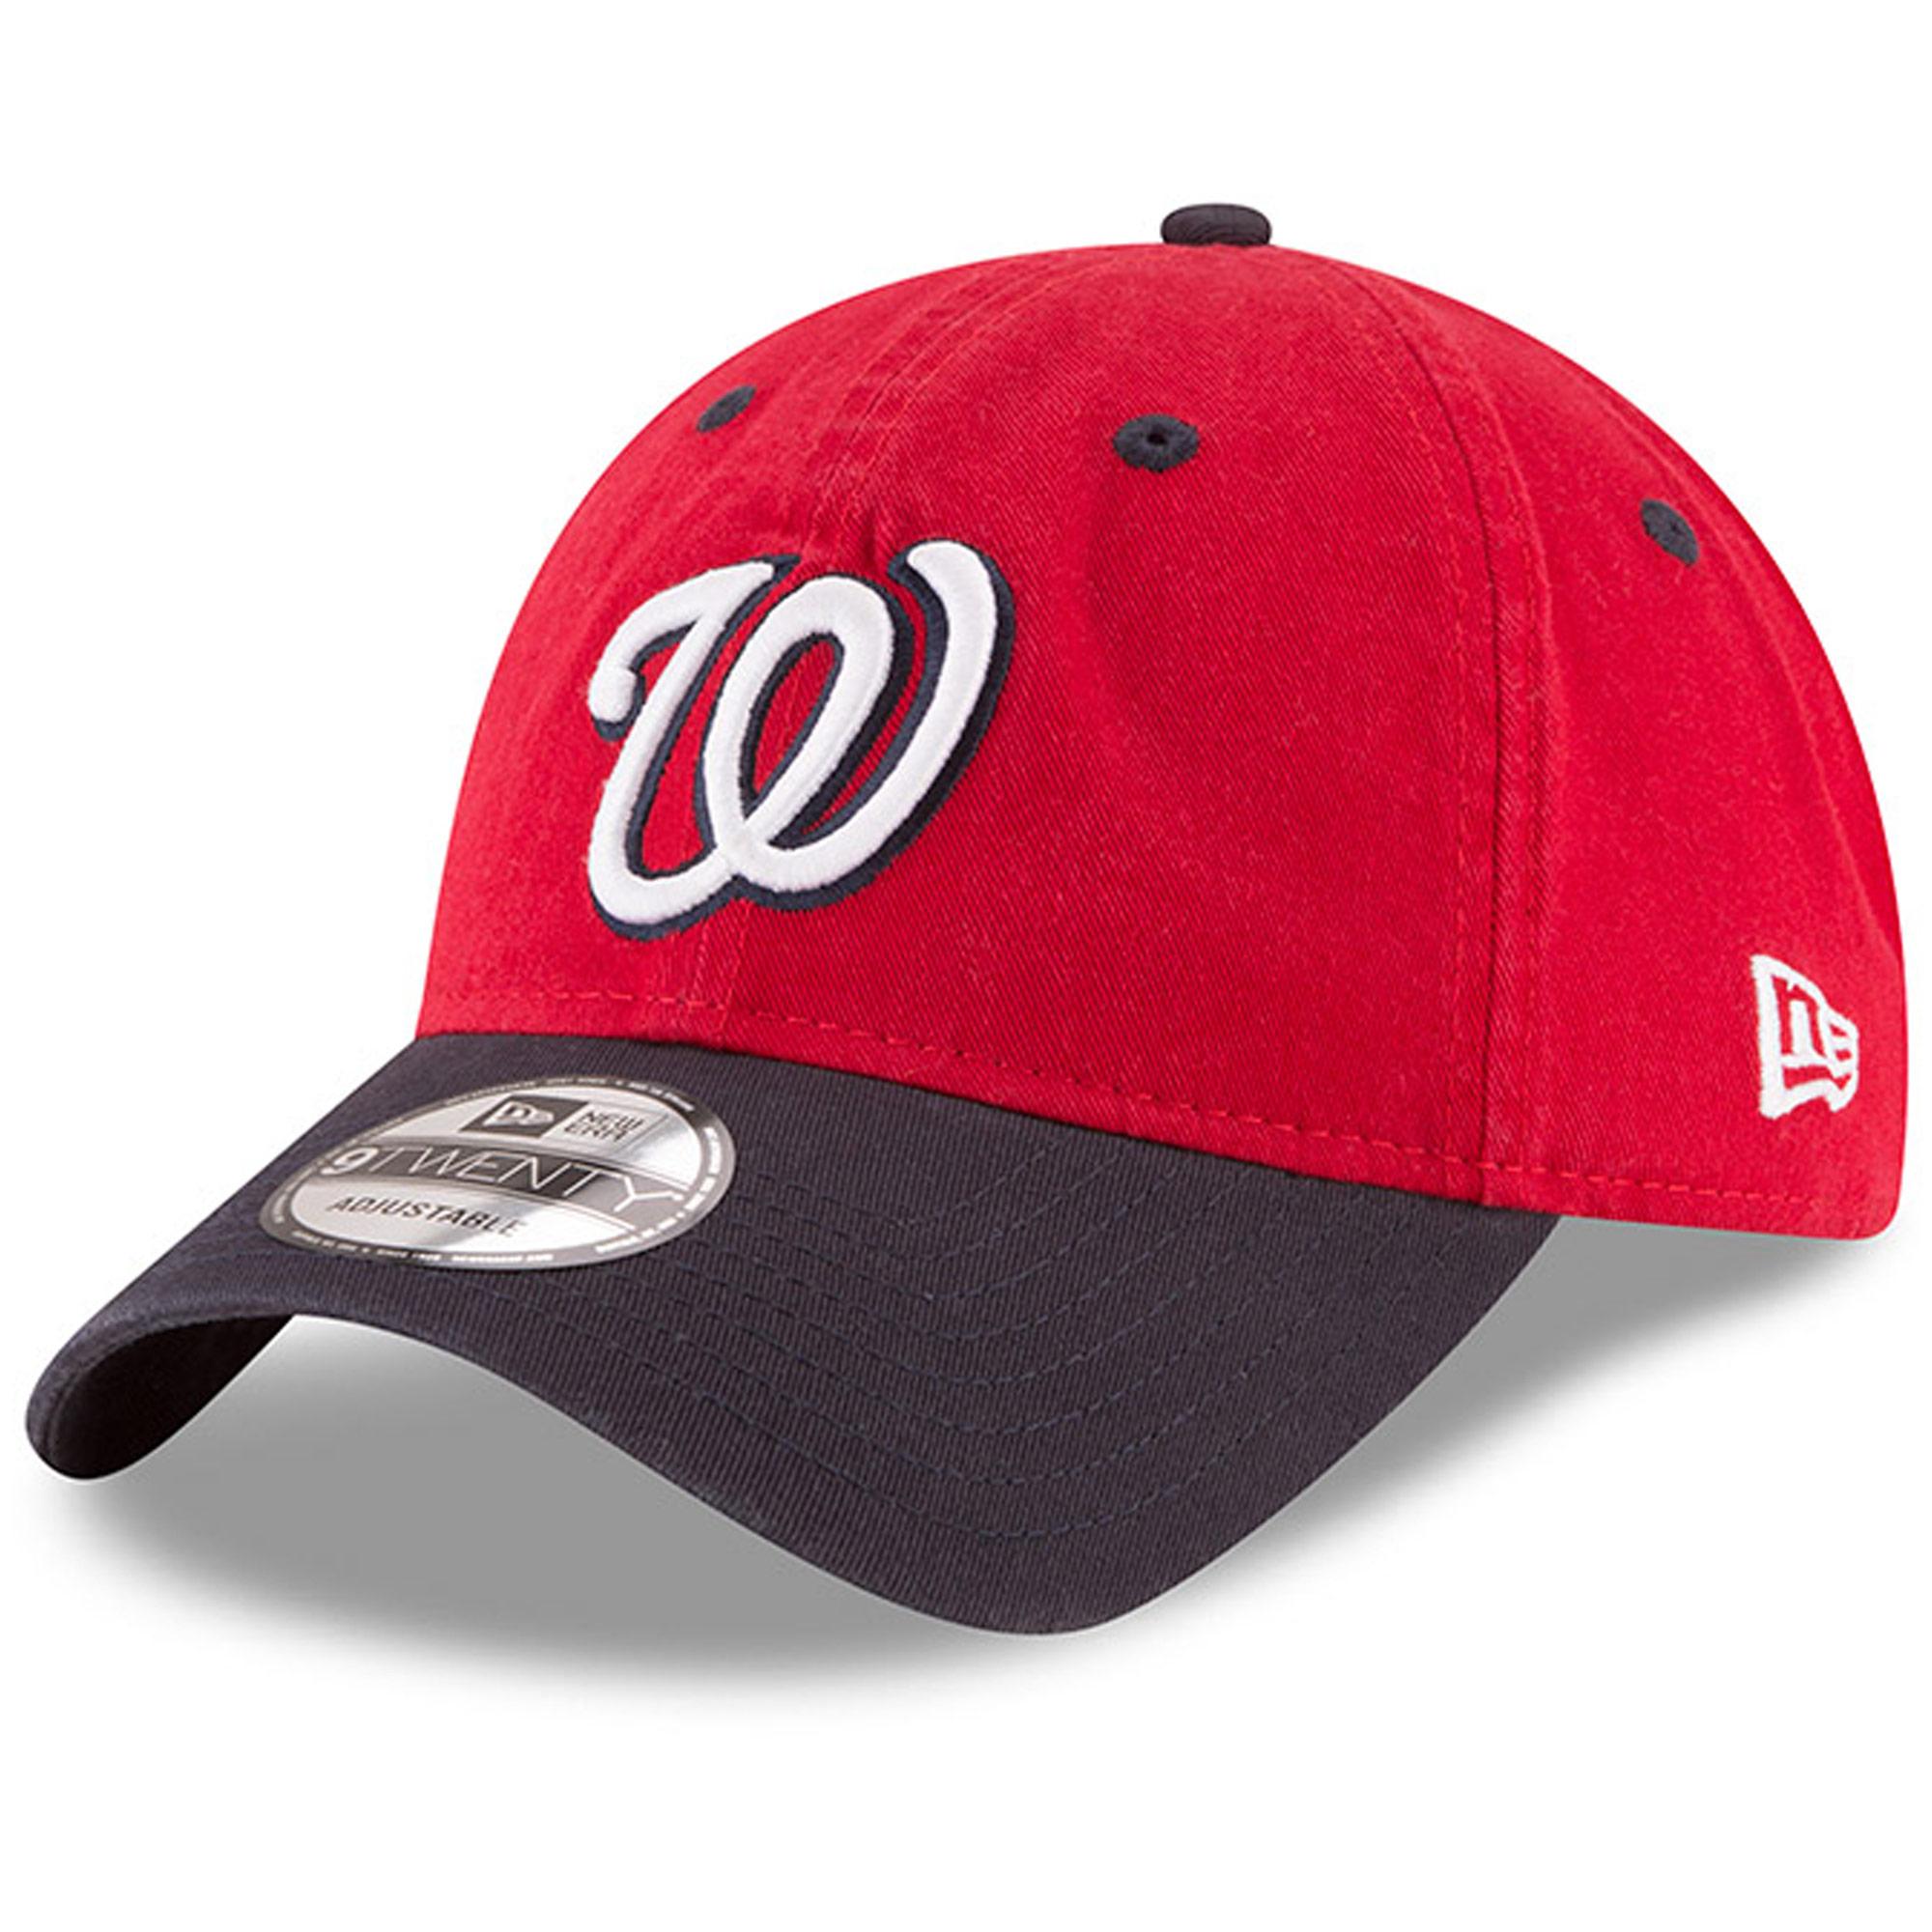 Washington Nationals New Era Alternate 2 Replica Core Classic 9TWENTY Adjustable Hat - Red/Navy - OSFA